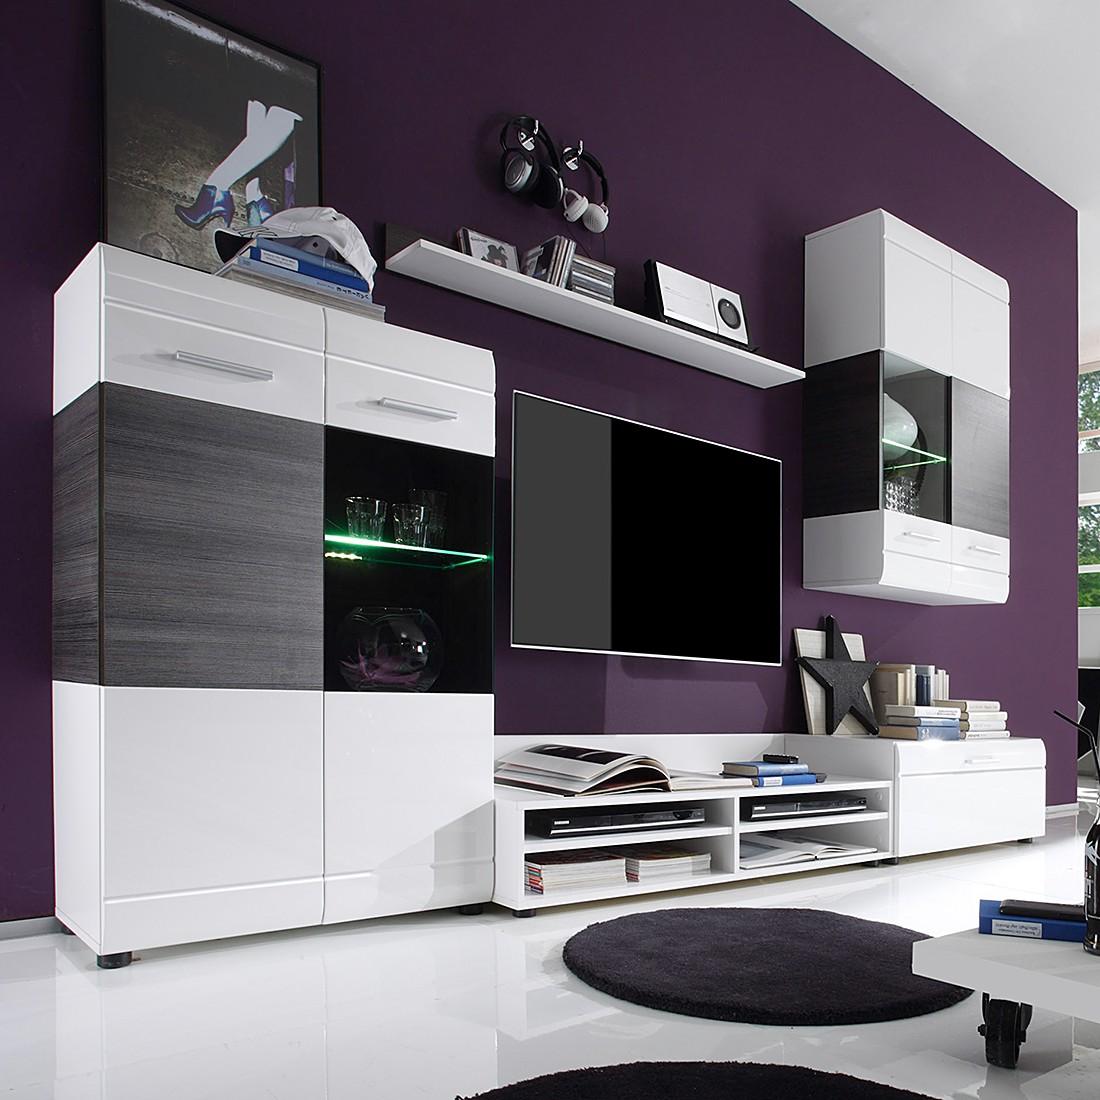 wohnwand jean 4 teilig inkl beleuchtung wei laricio pinie dekor ma e 270 x 180 x 44 cm. Black Bedroom Furniture Sets. Home Design Ideas